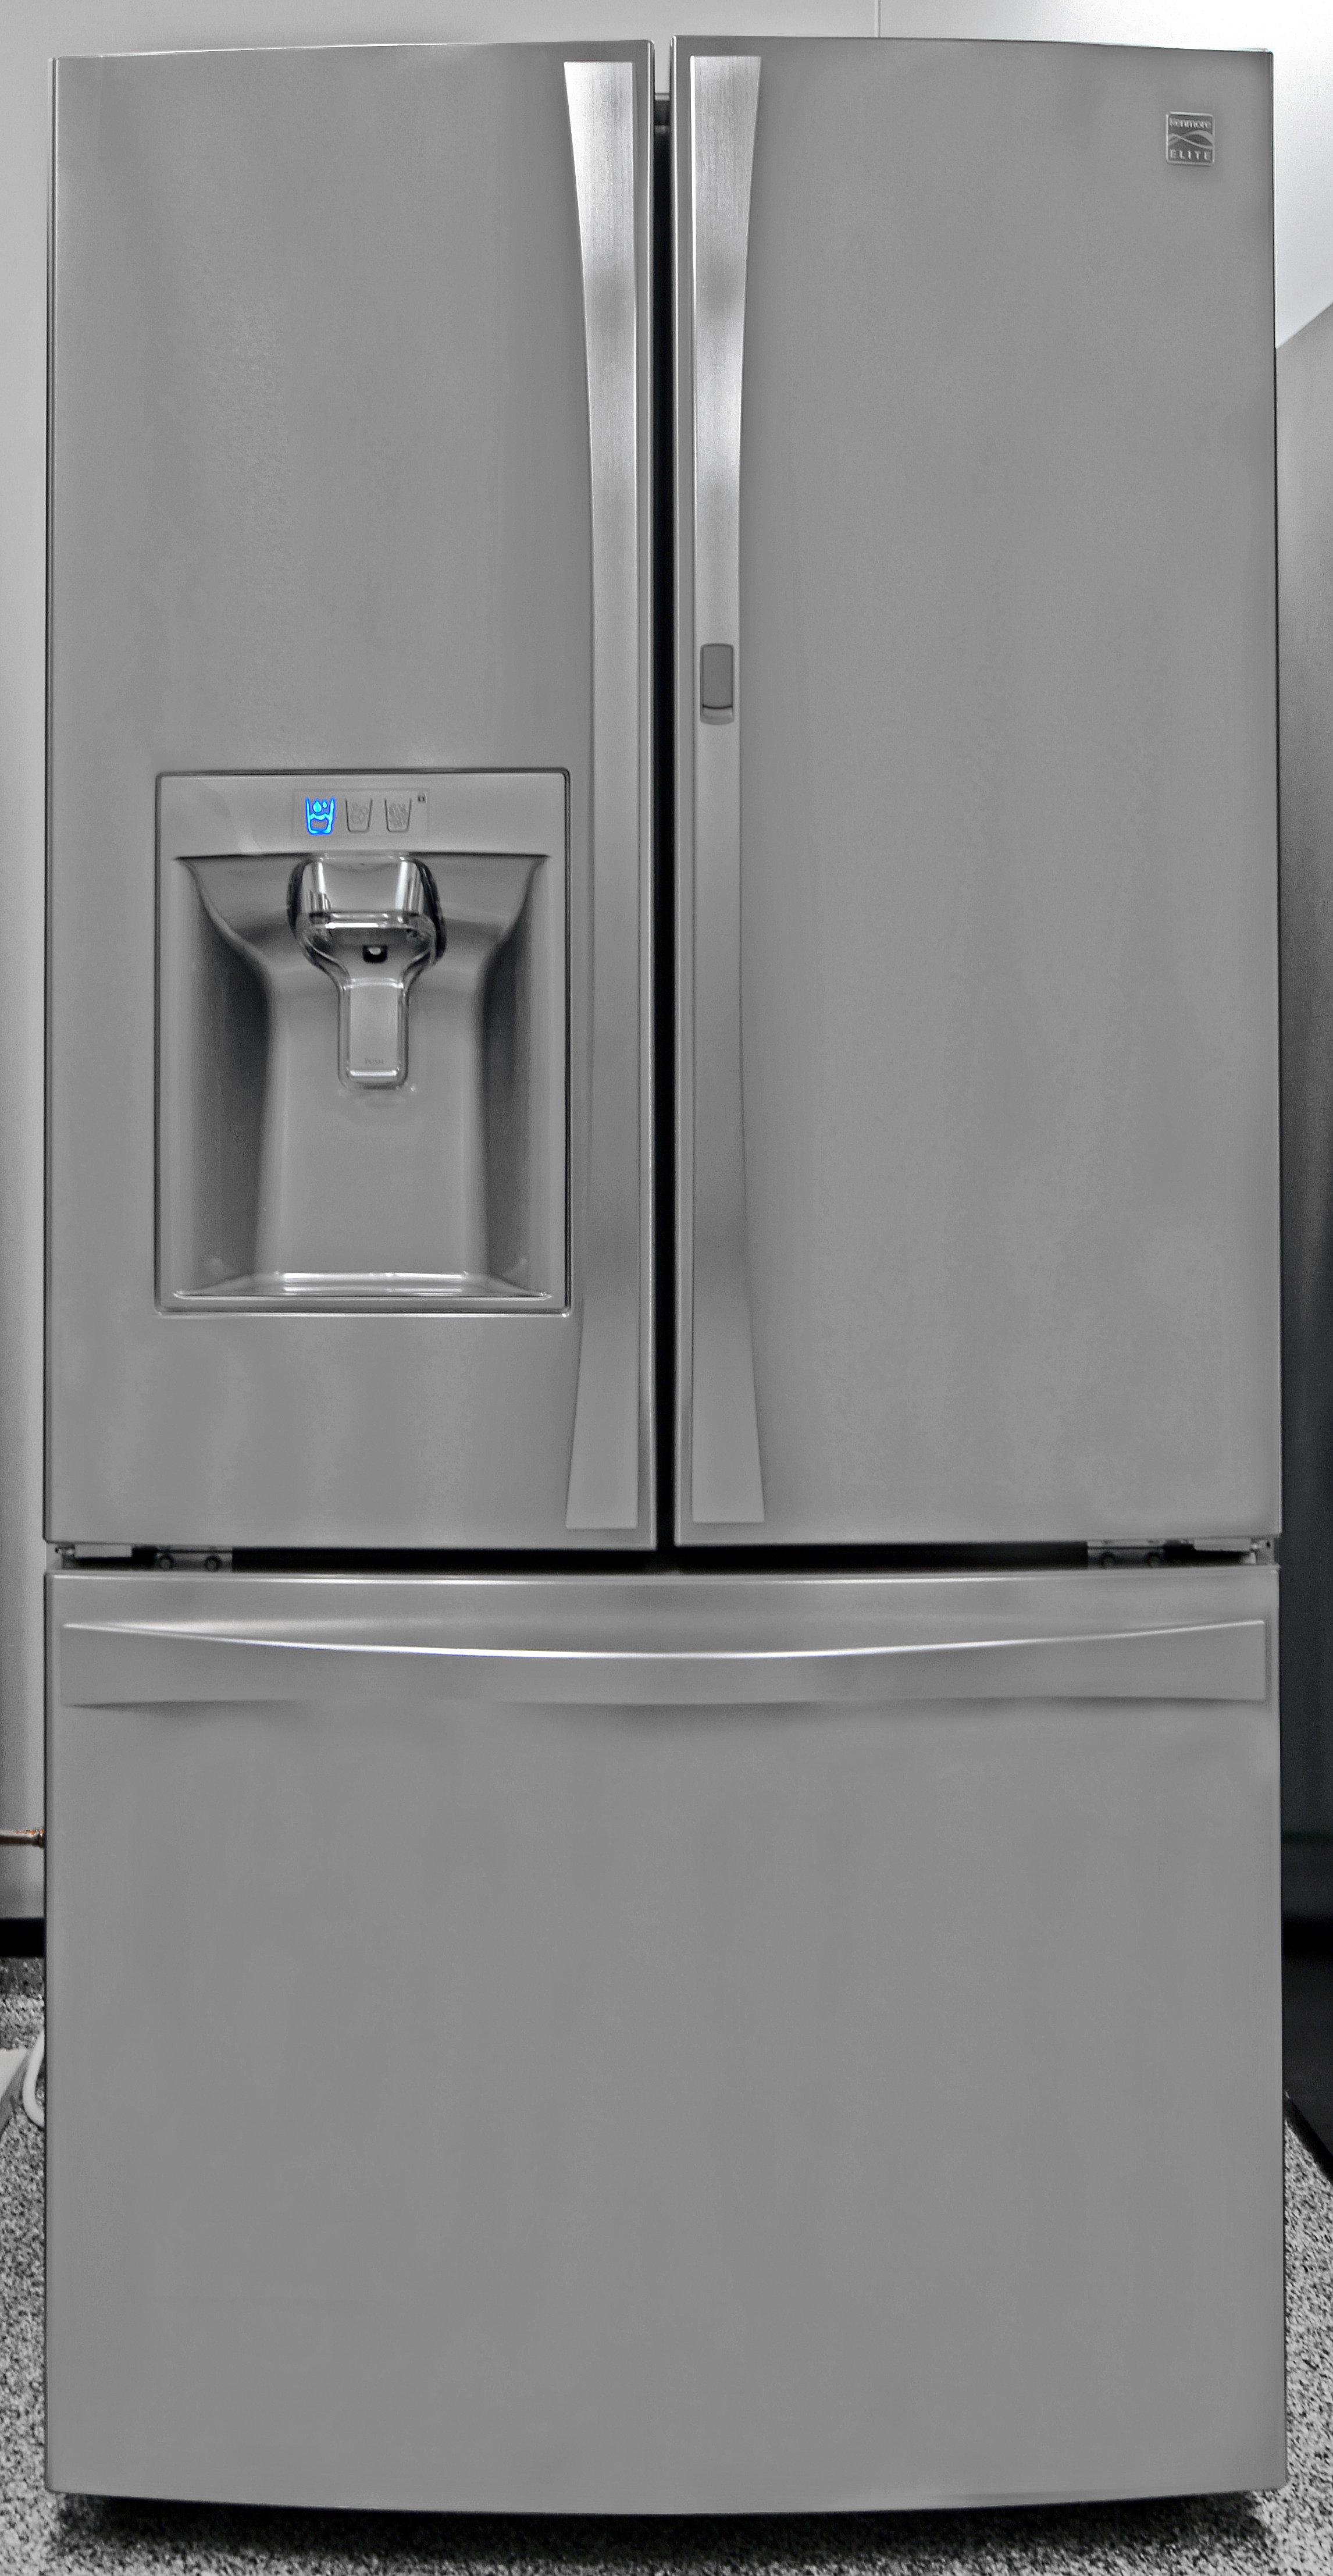 Upscale Kitchen Appliances Kenmore Elite 74033 Refrigerator Review Reviewedcom Refrigerators